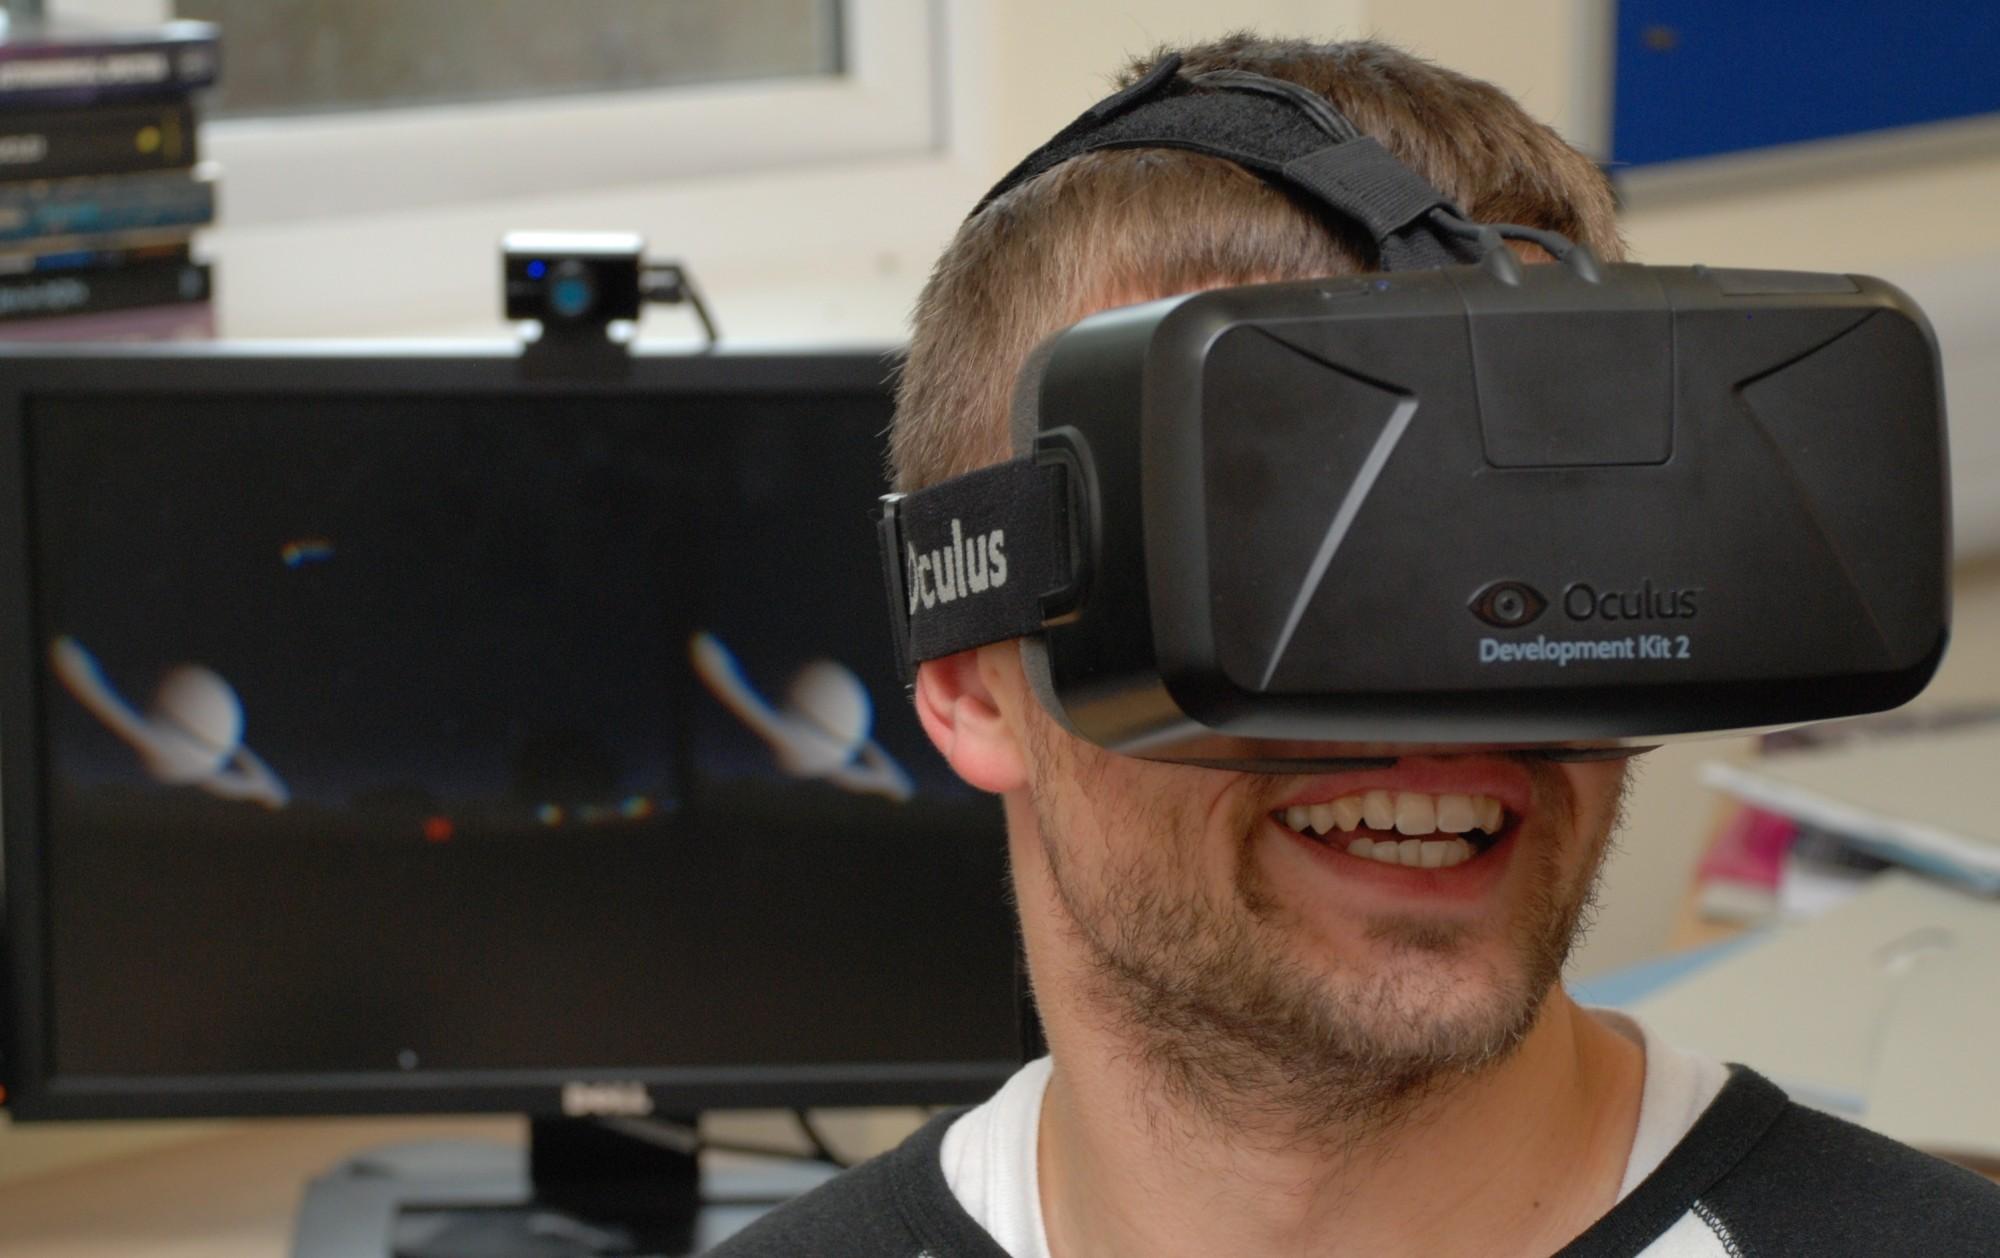 Student John Timlin using the prototype Starsight software on the Oculus Rift headset. Credit: Jason Cowan, UK ATC